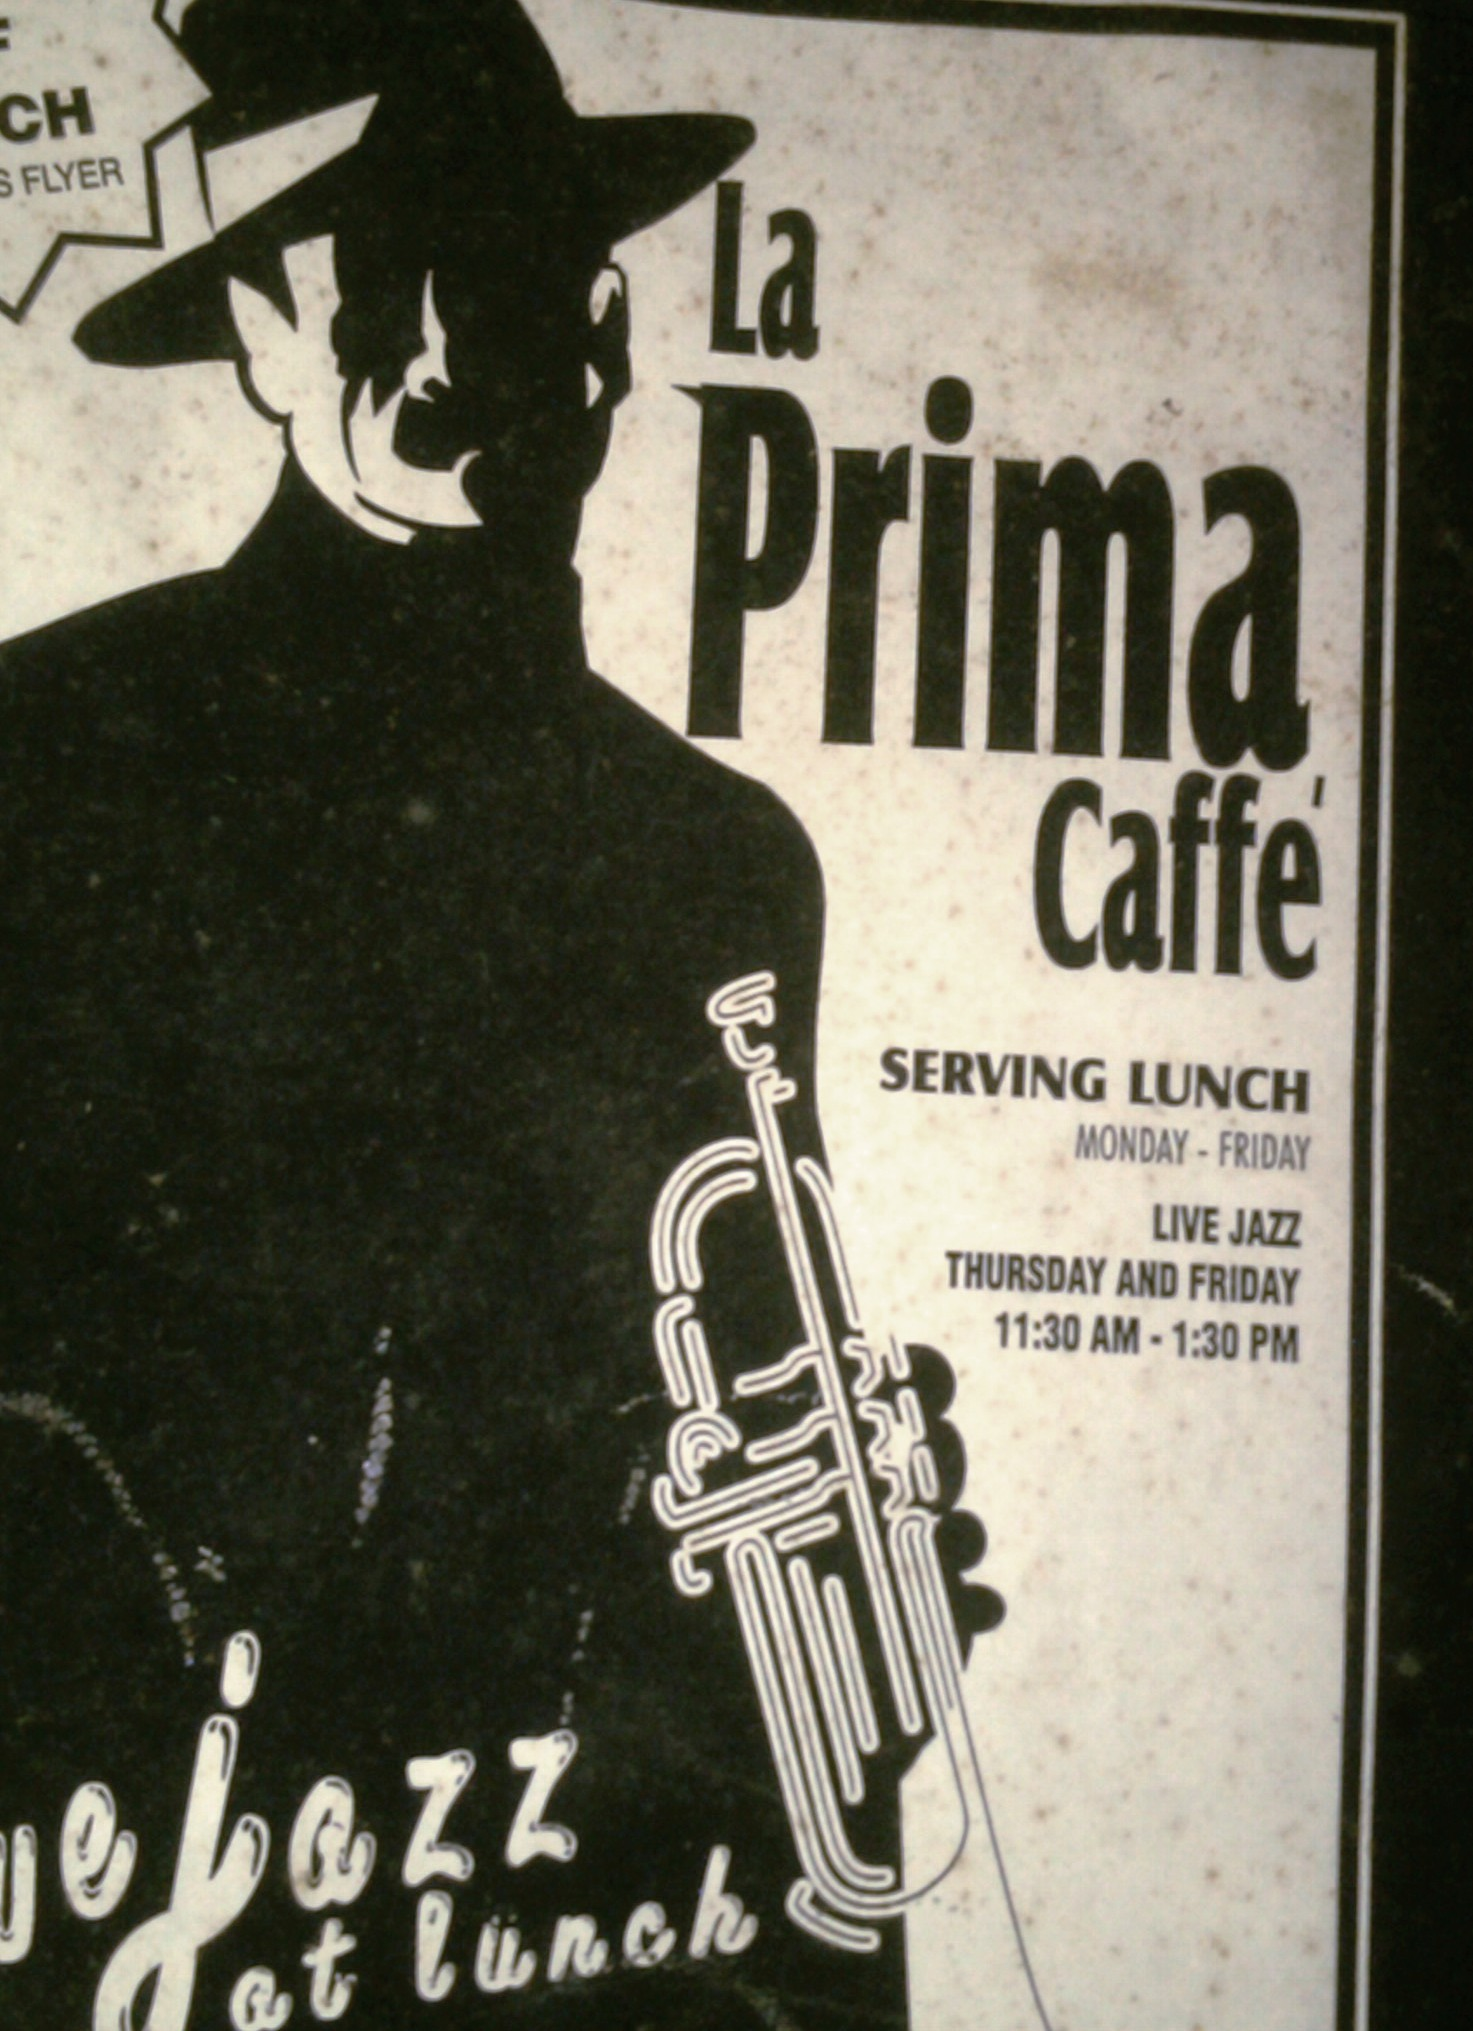 1st flyer -menu 97